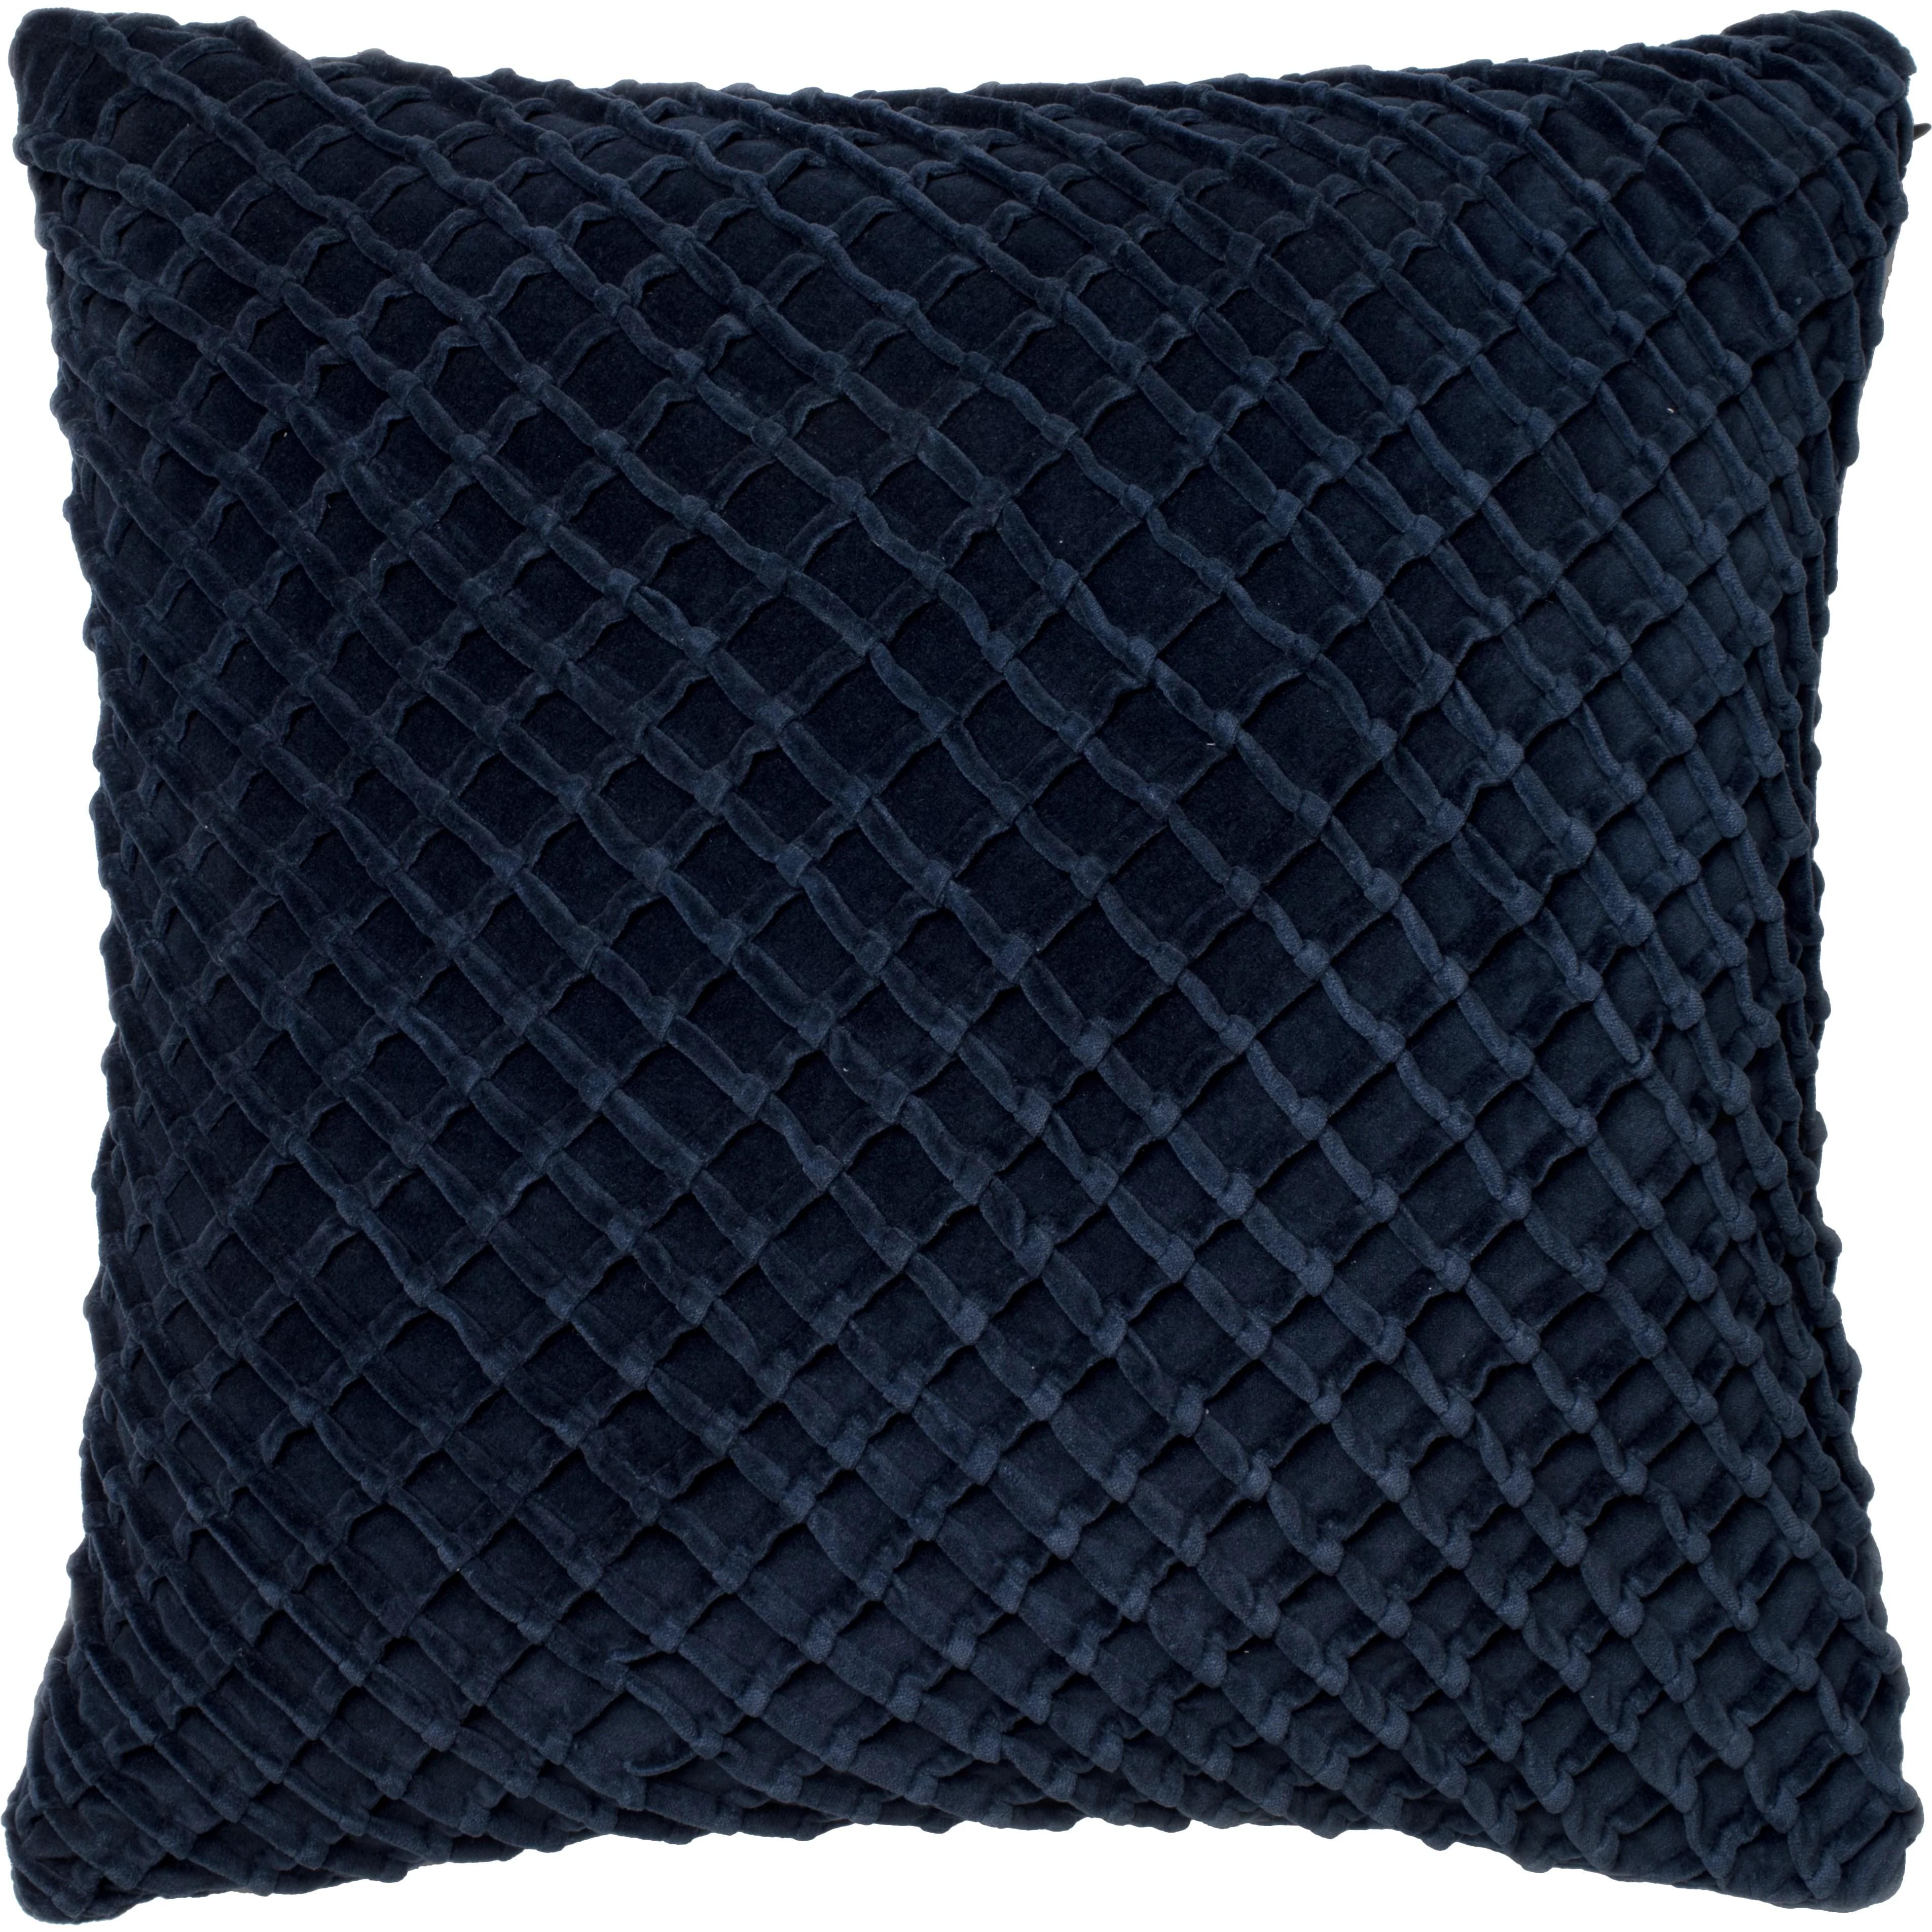 Loloi Rugs Throw Pillow & Reviews